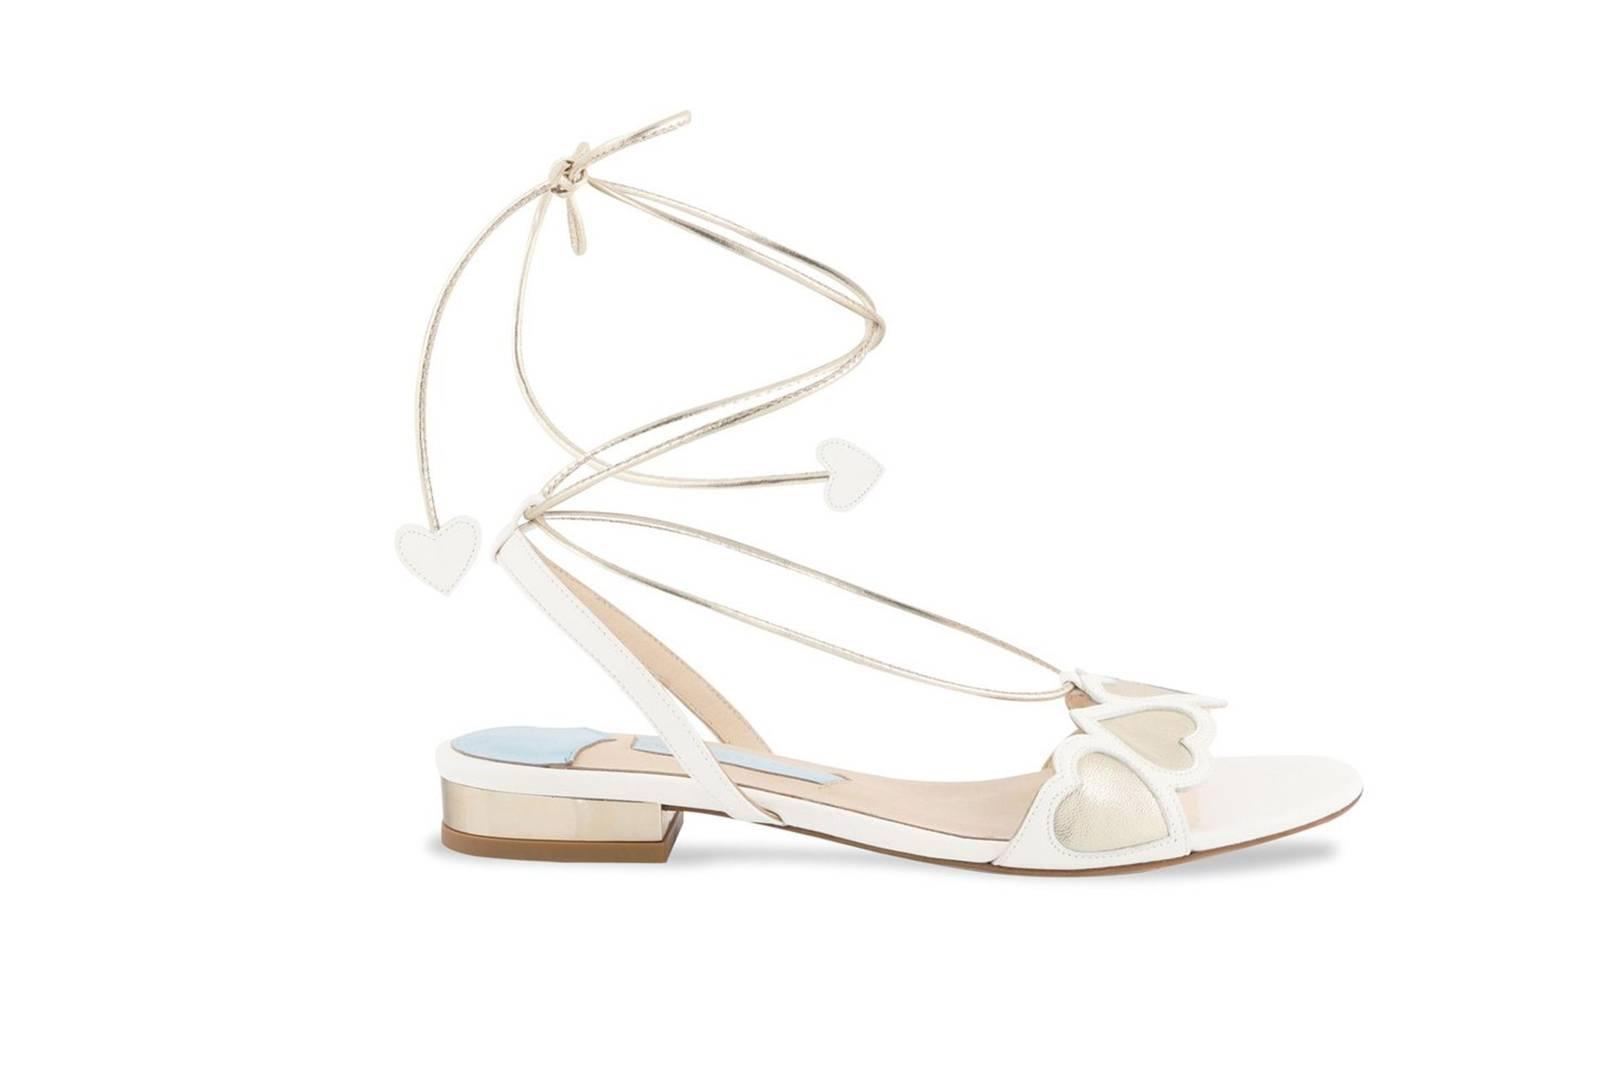 64f51a16c77b5a The Most Beautiful Flat Wedding Shoes